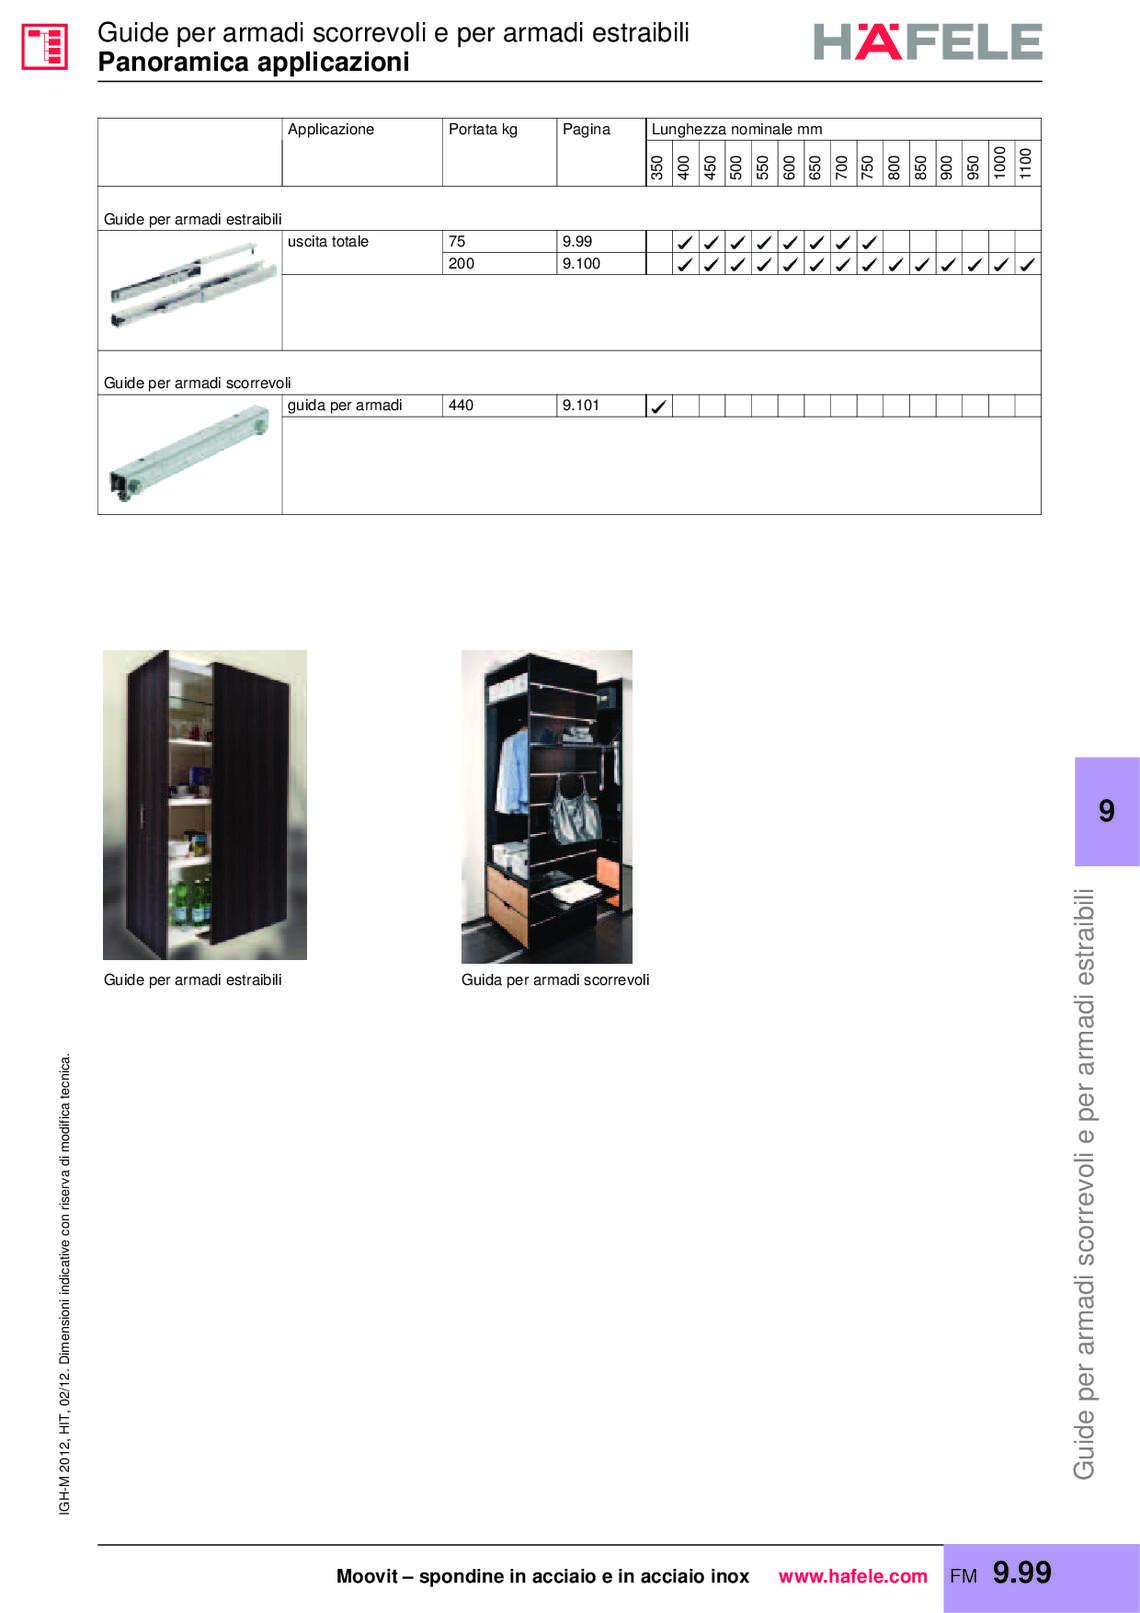 hafele-spondine-e-guide-per-mobili_40_146.jpg